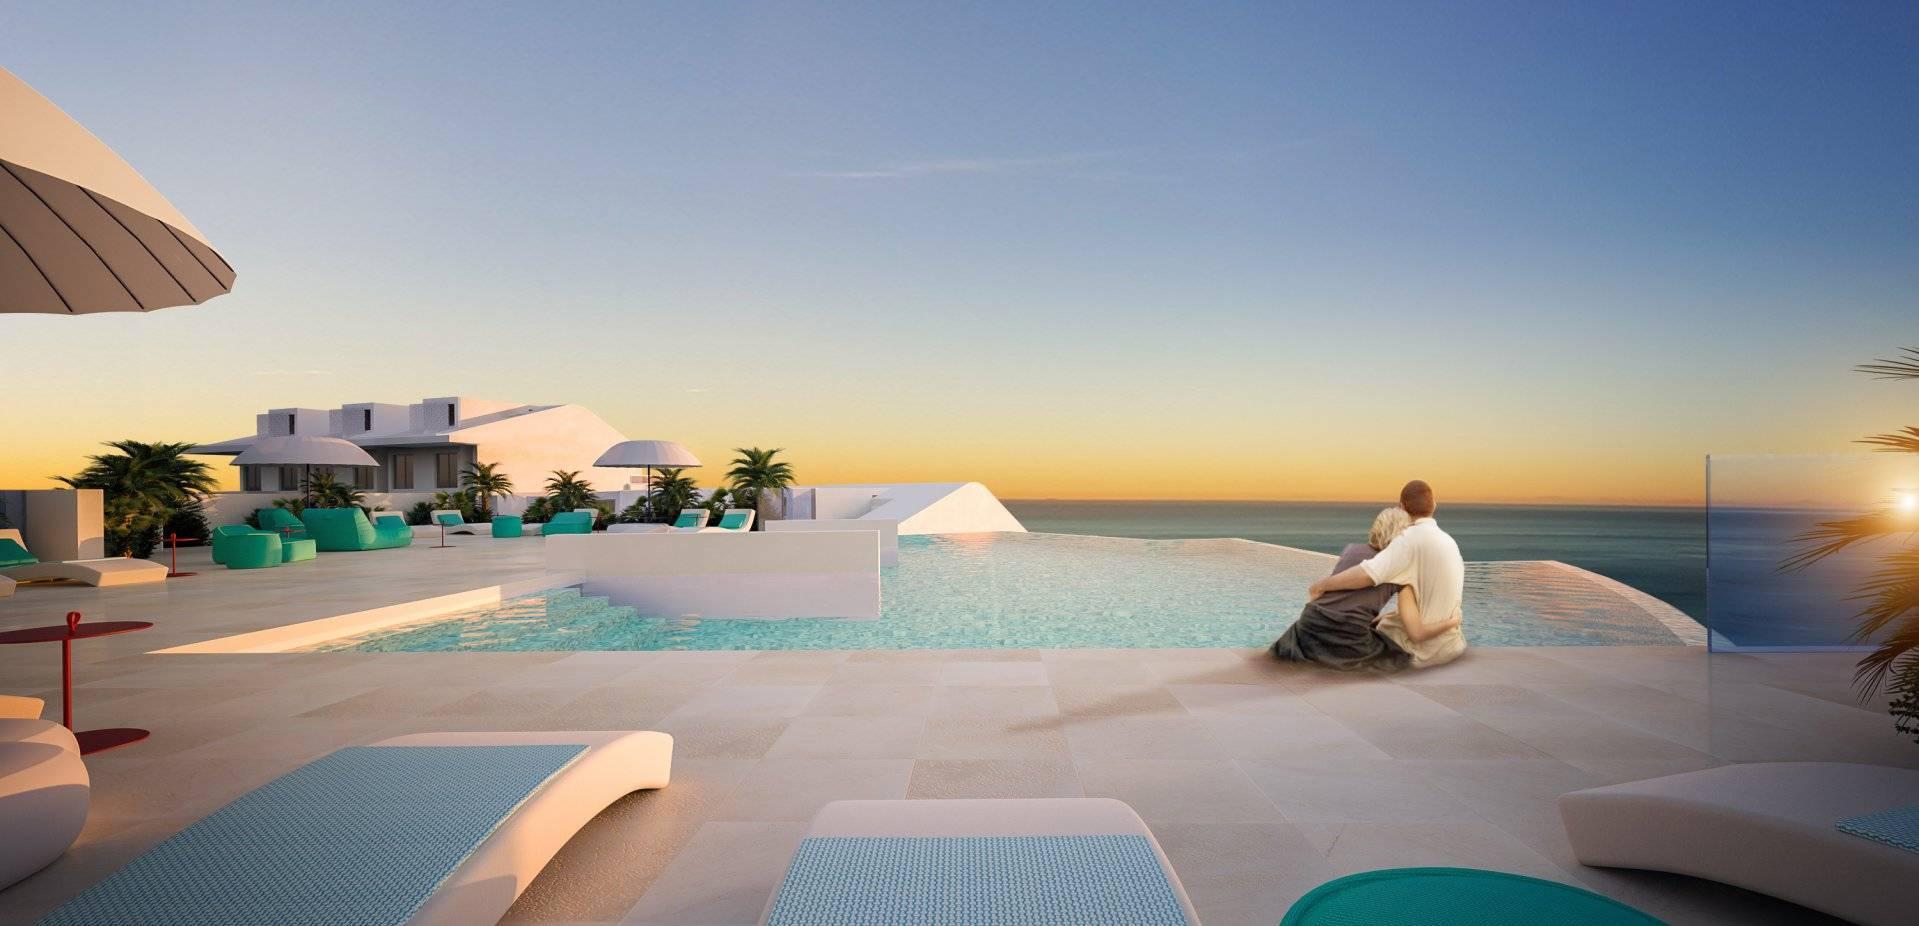 Bedroom Swimming pool